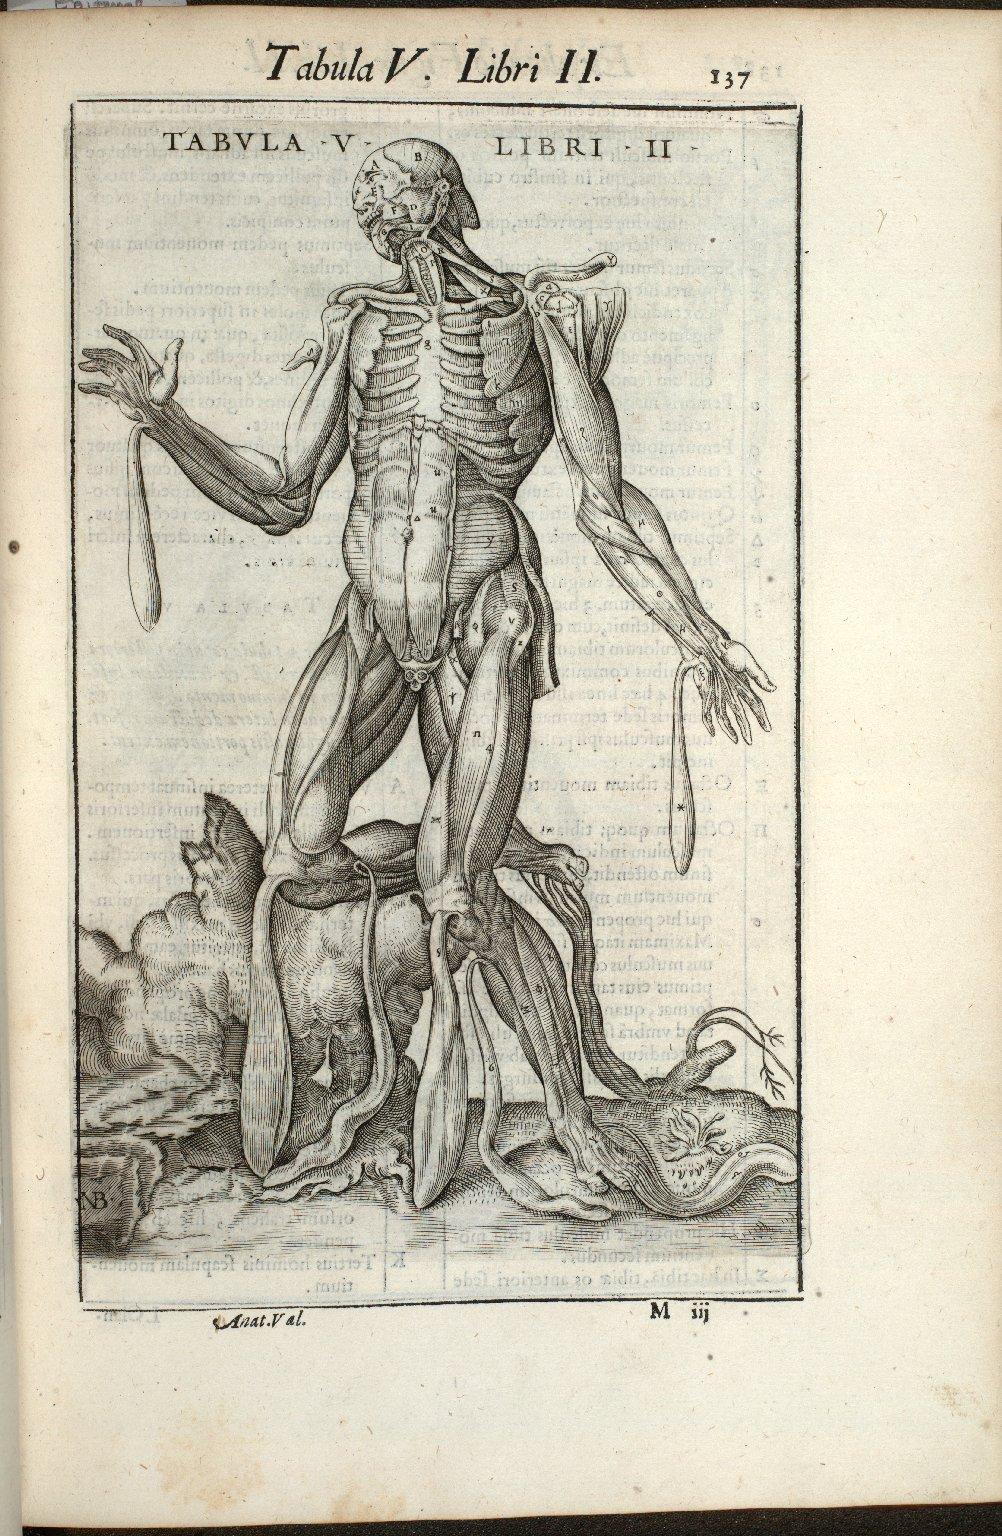 Tabula V. Libri II.